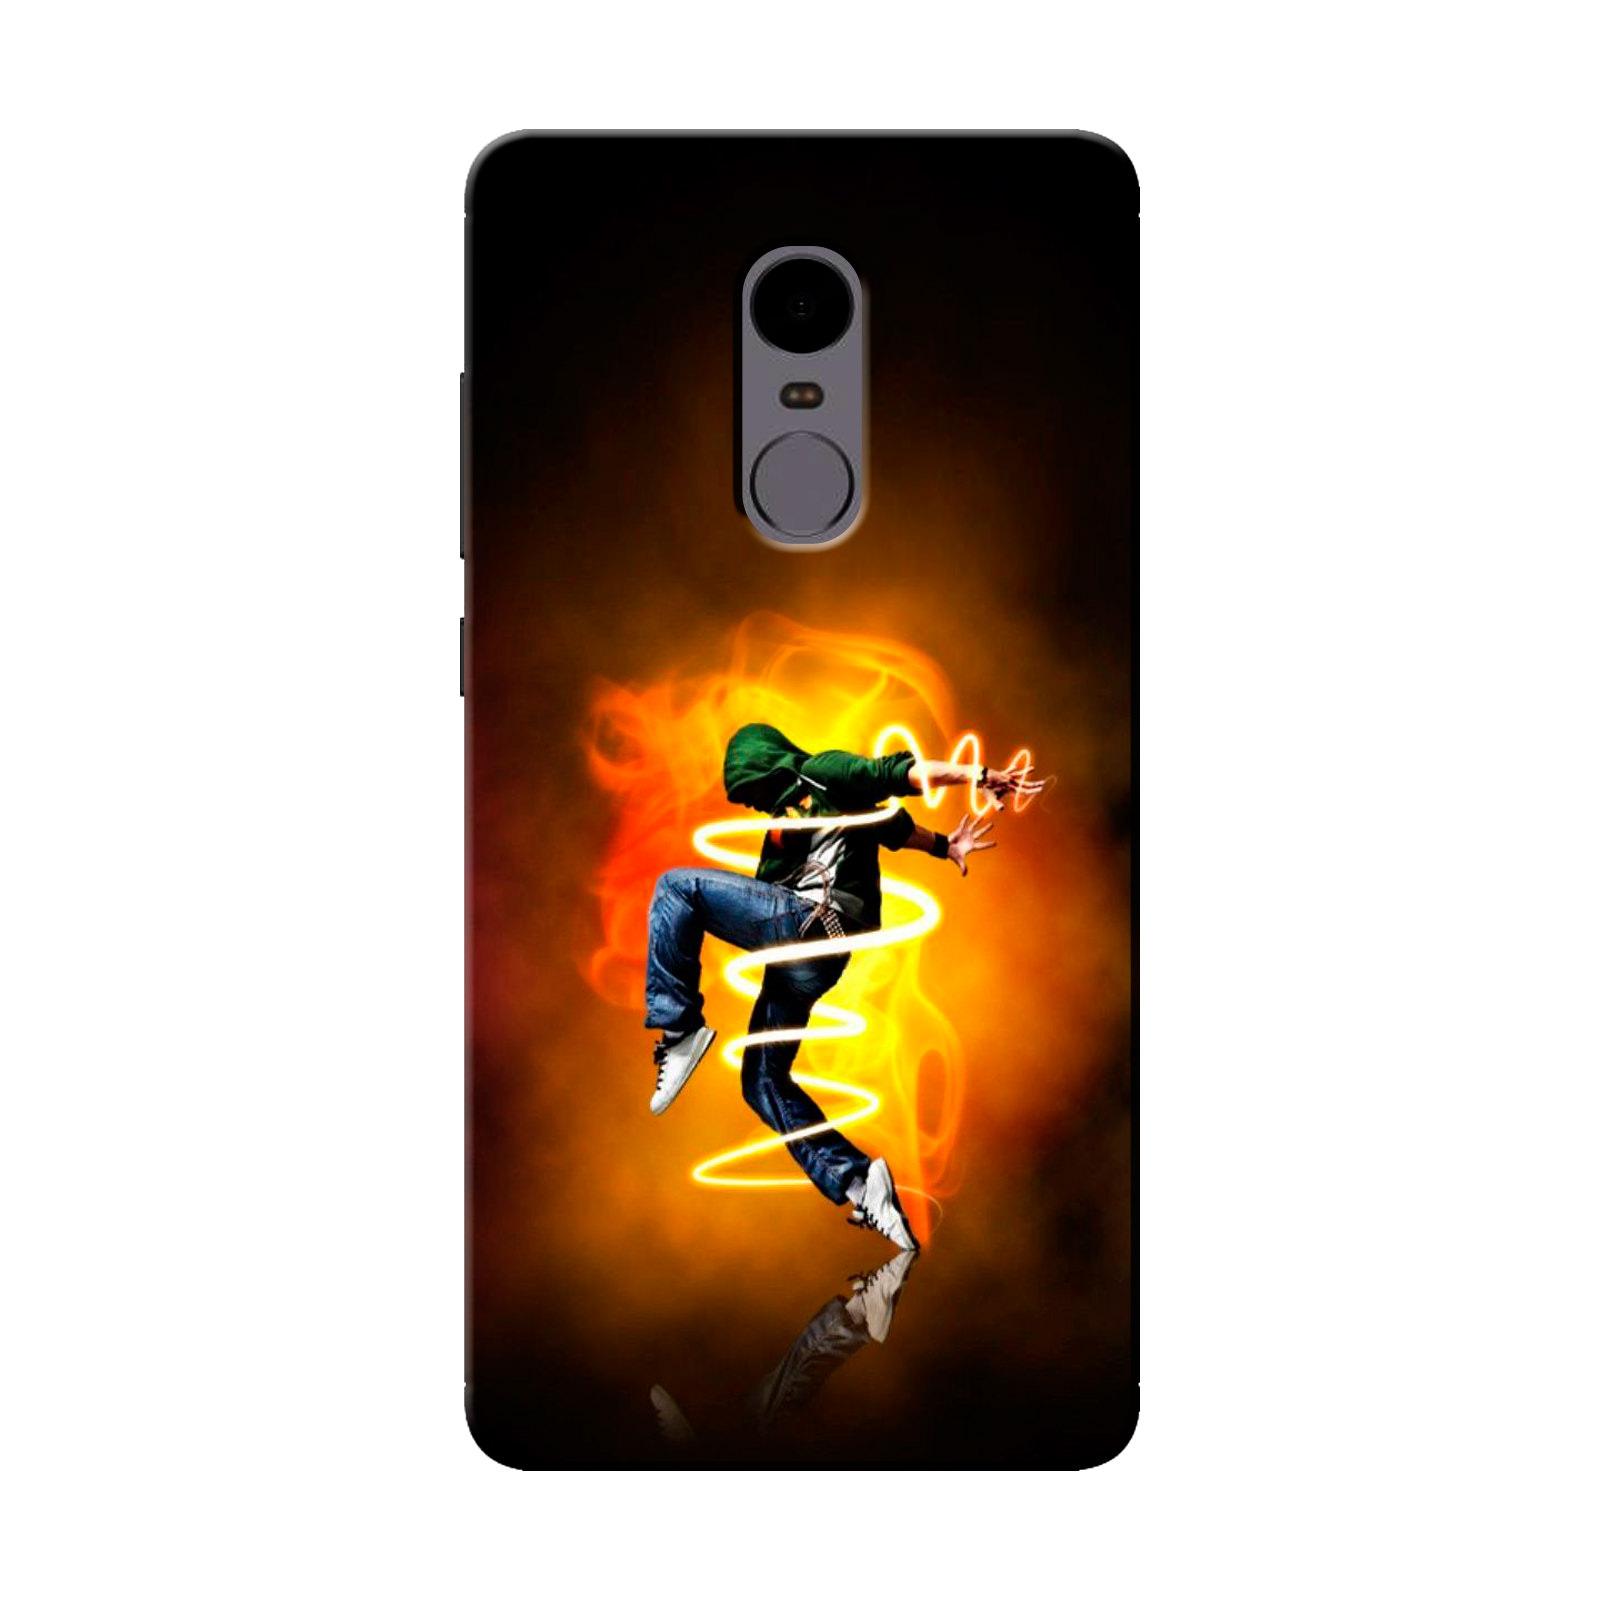 sairafashions Wild Thunder Mi Redmi Note 4 Mobile Back Cover Case And Designer Printed Hard Flexible Mobile Case Cover  - 1146